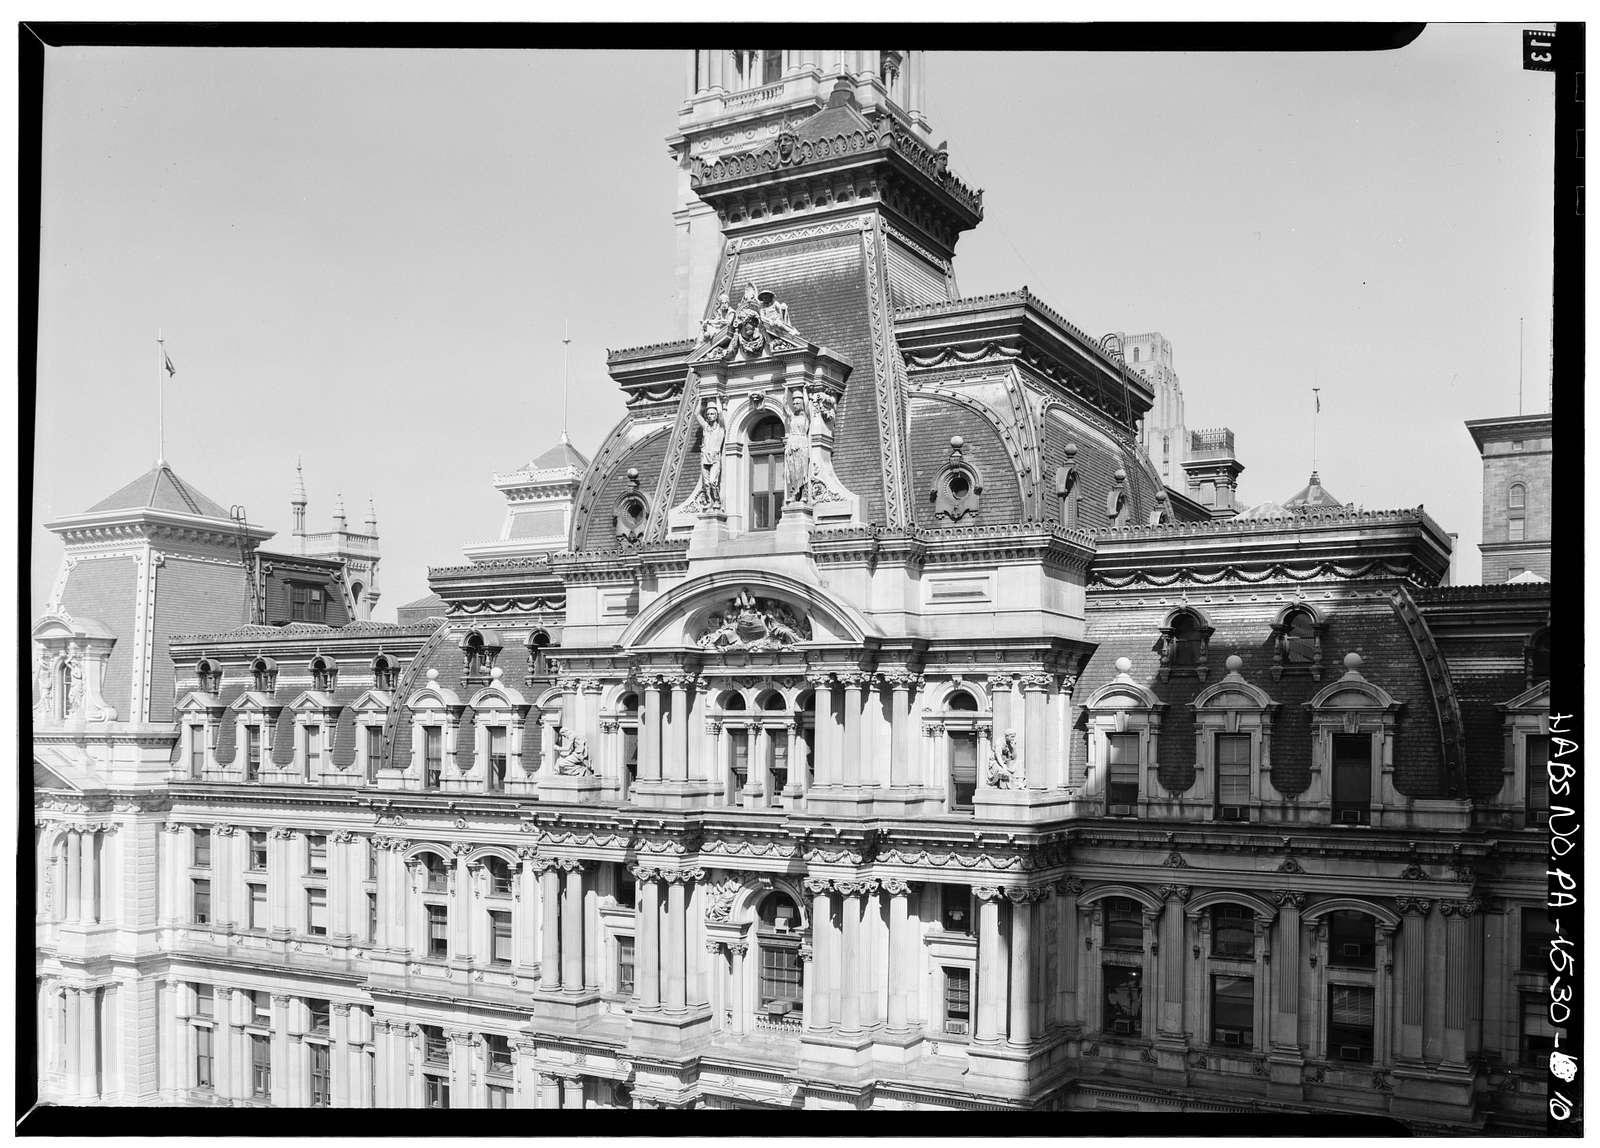 The New Public Buildings, Penn Square, Broad & Market Streets, Philadelphia, Philadelphia County, PA